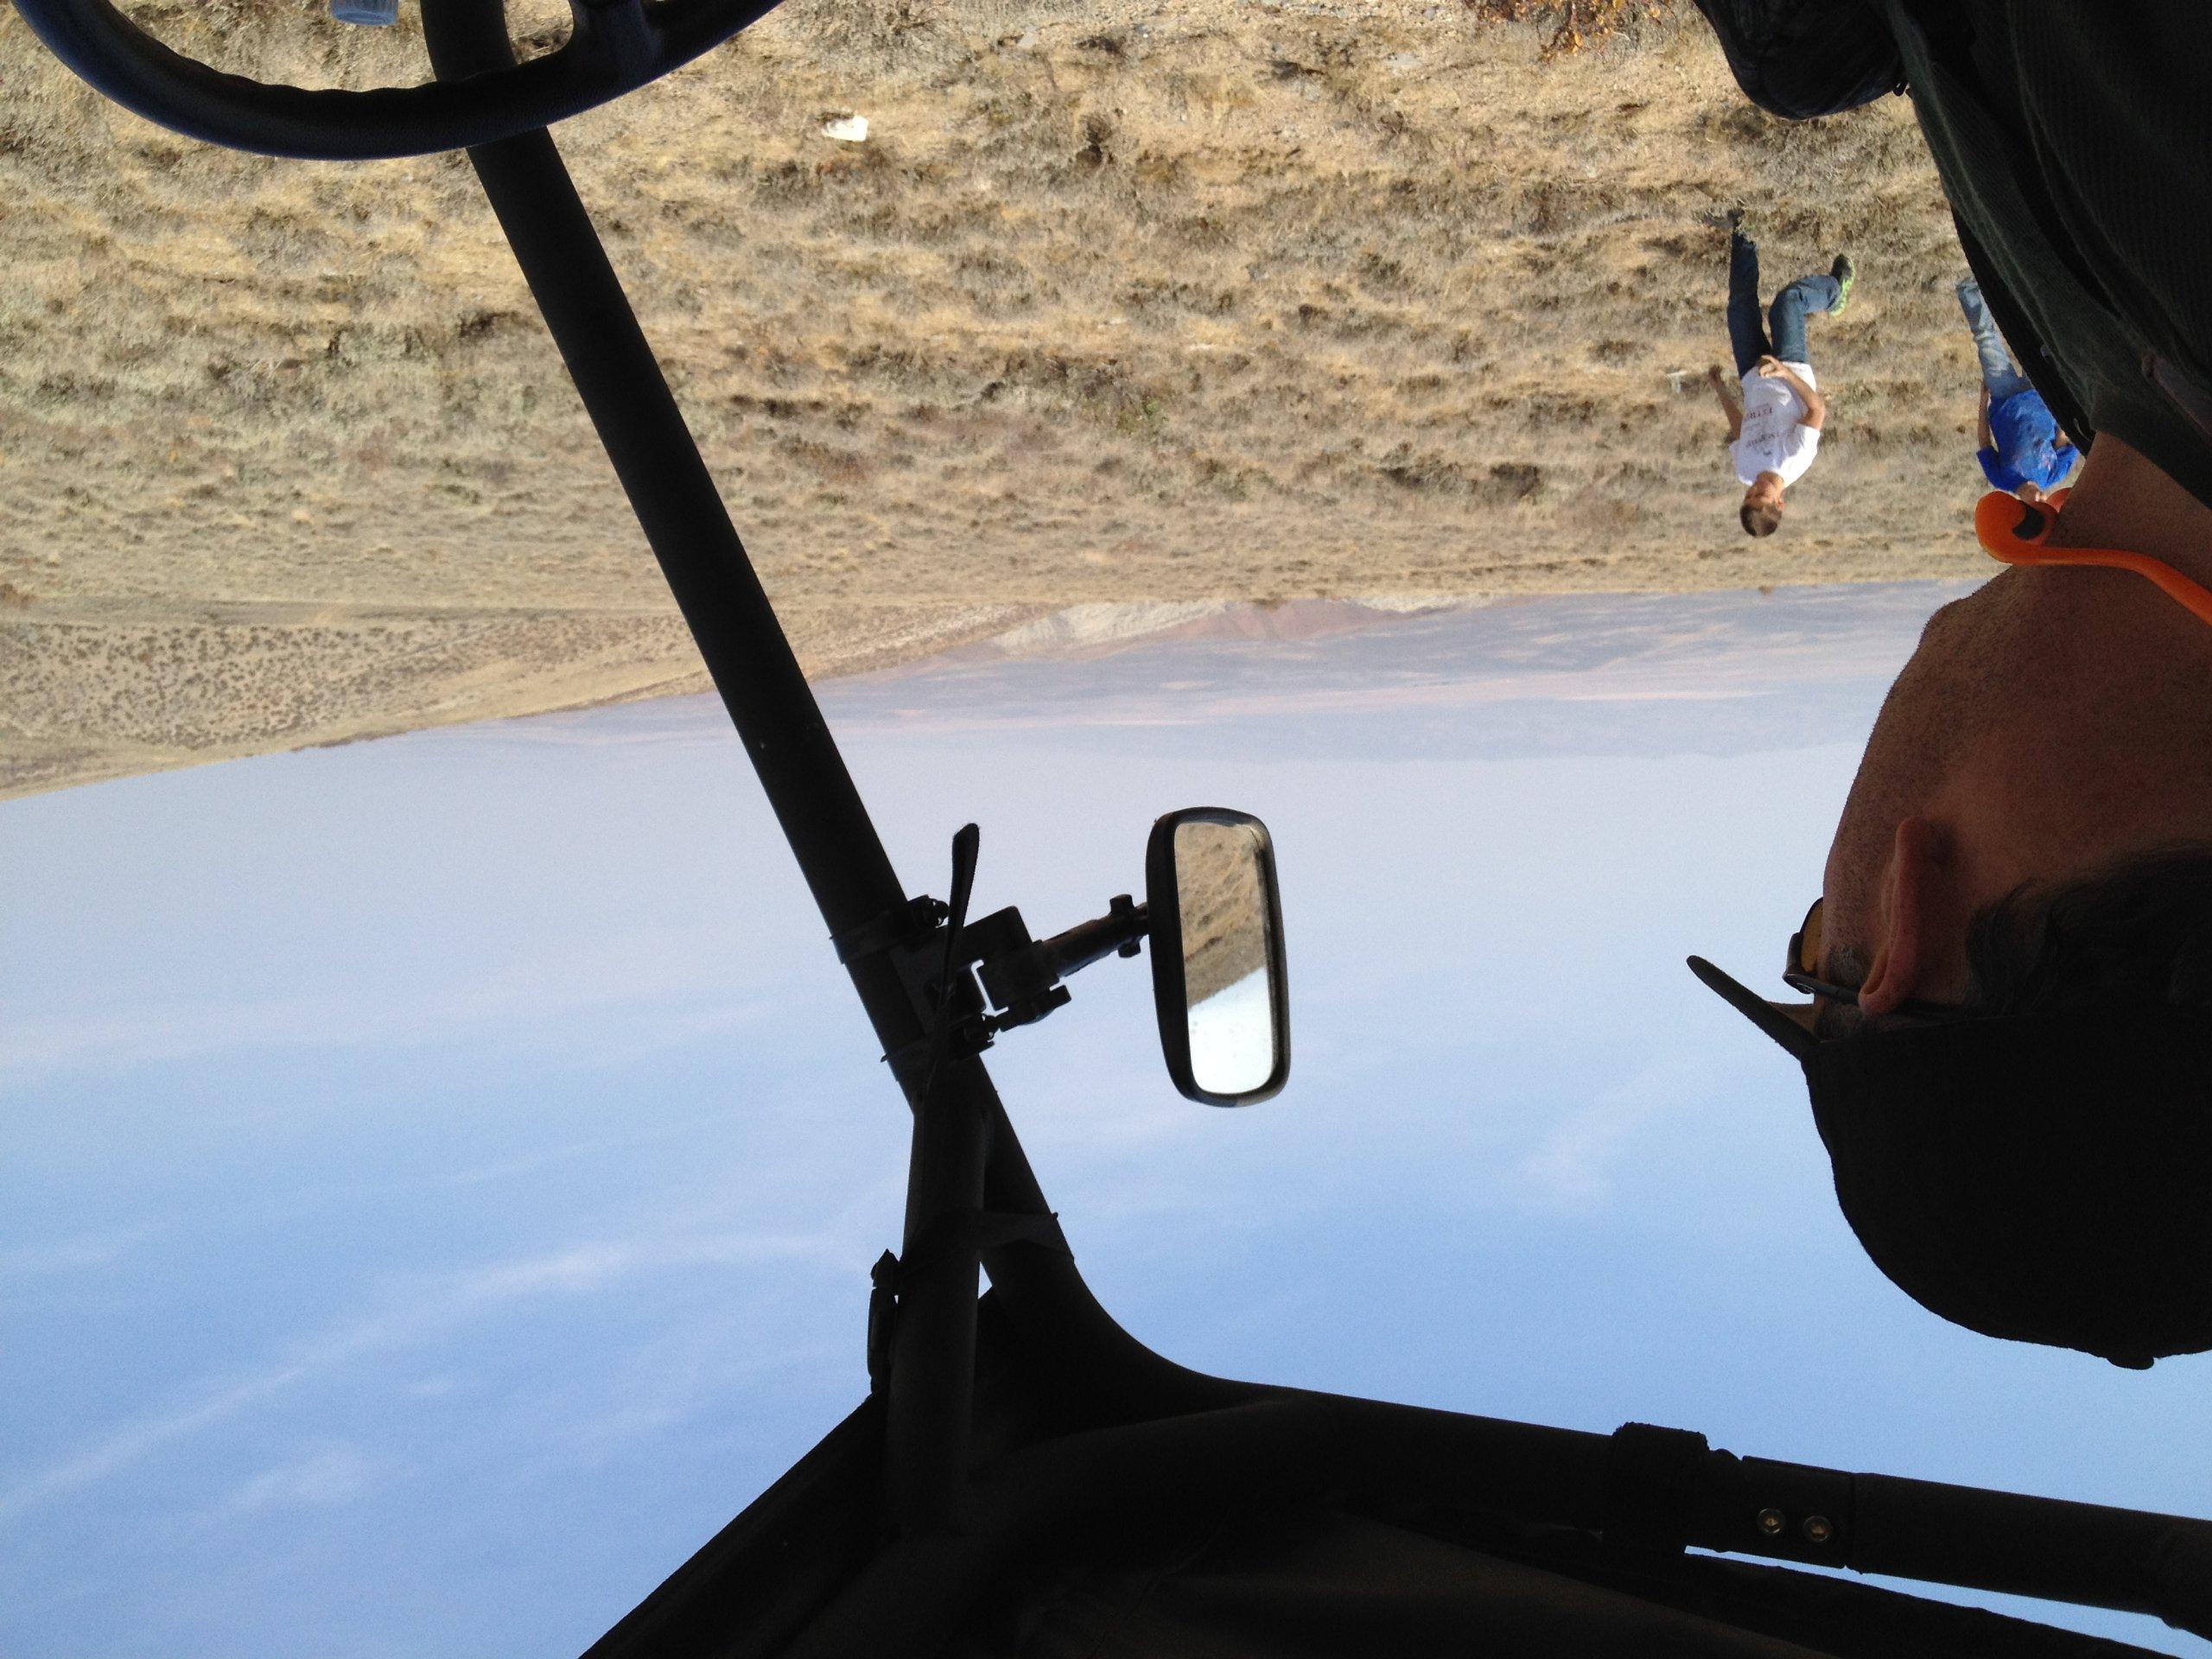 ATV Tek UTV Mirror, Clearview With Vibration Isolator and Breakaway UTVMIR1 One Mirror